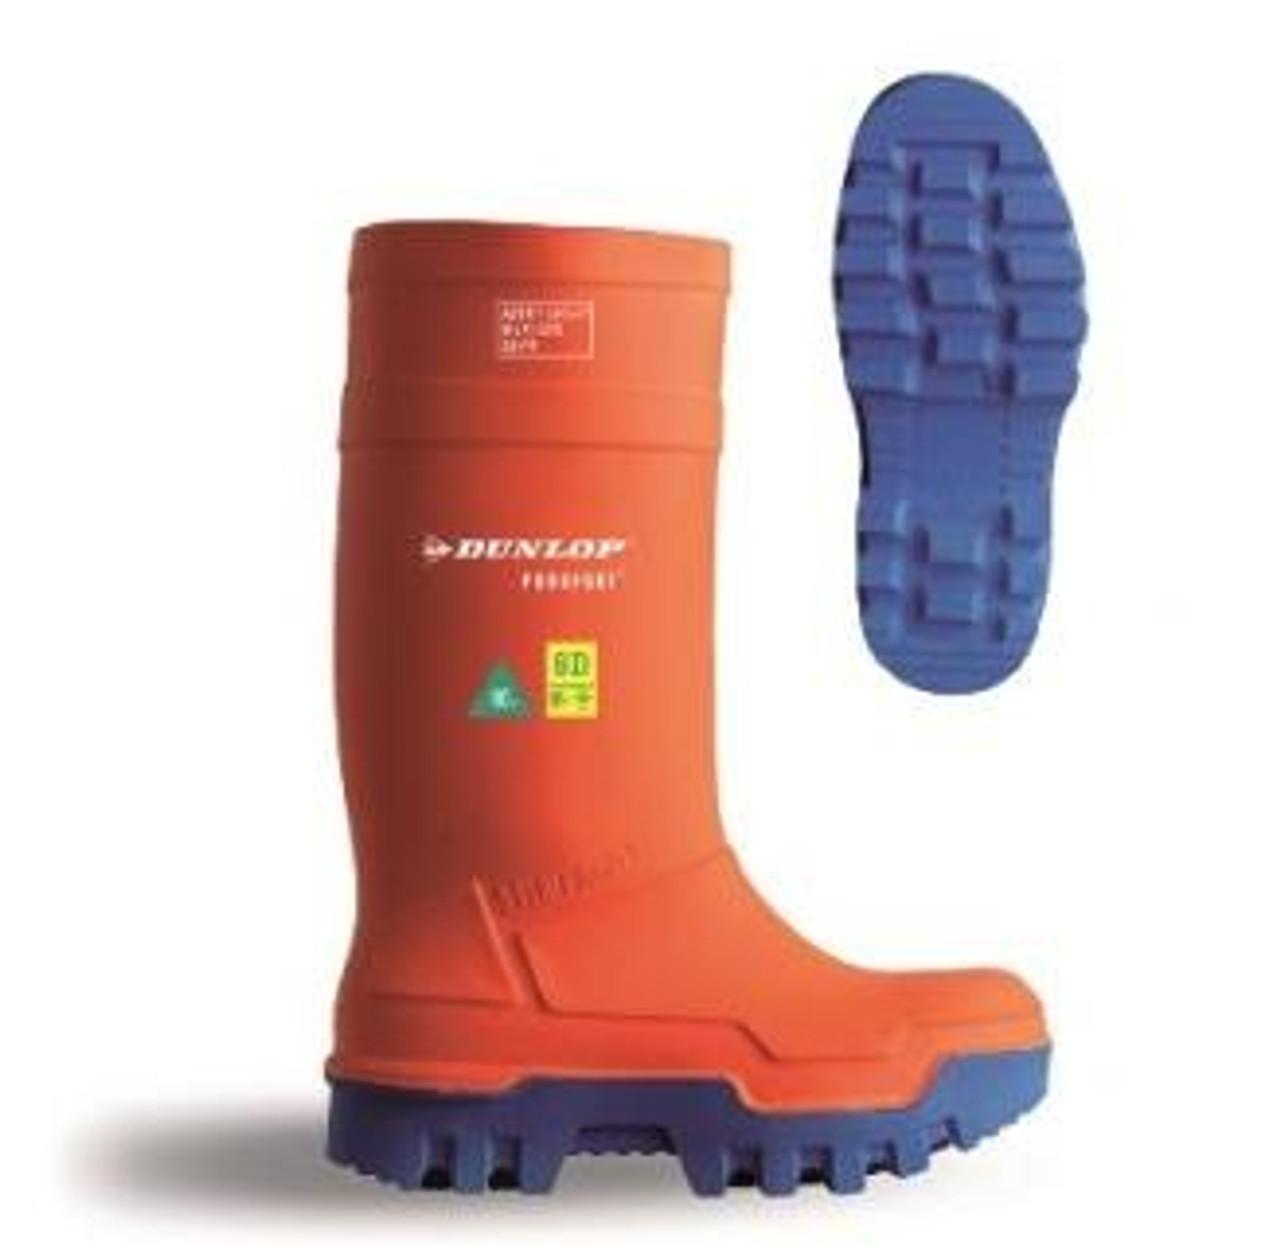 9b09282e0e7 Dunlop Purofort Thermo + Full Safety Orange Work Boot